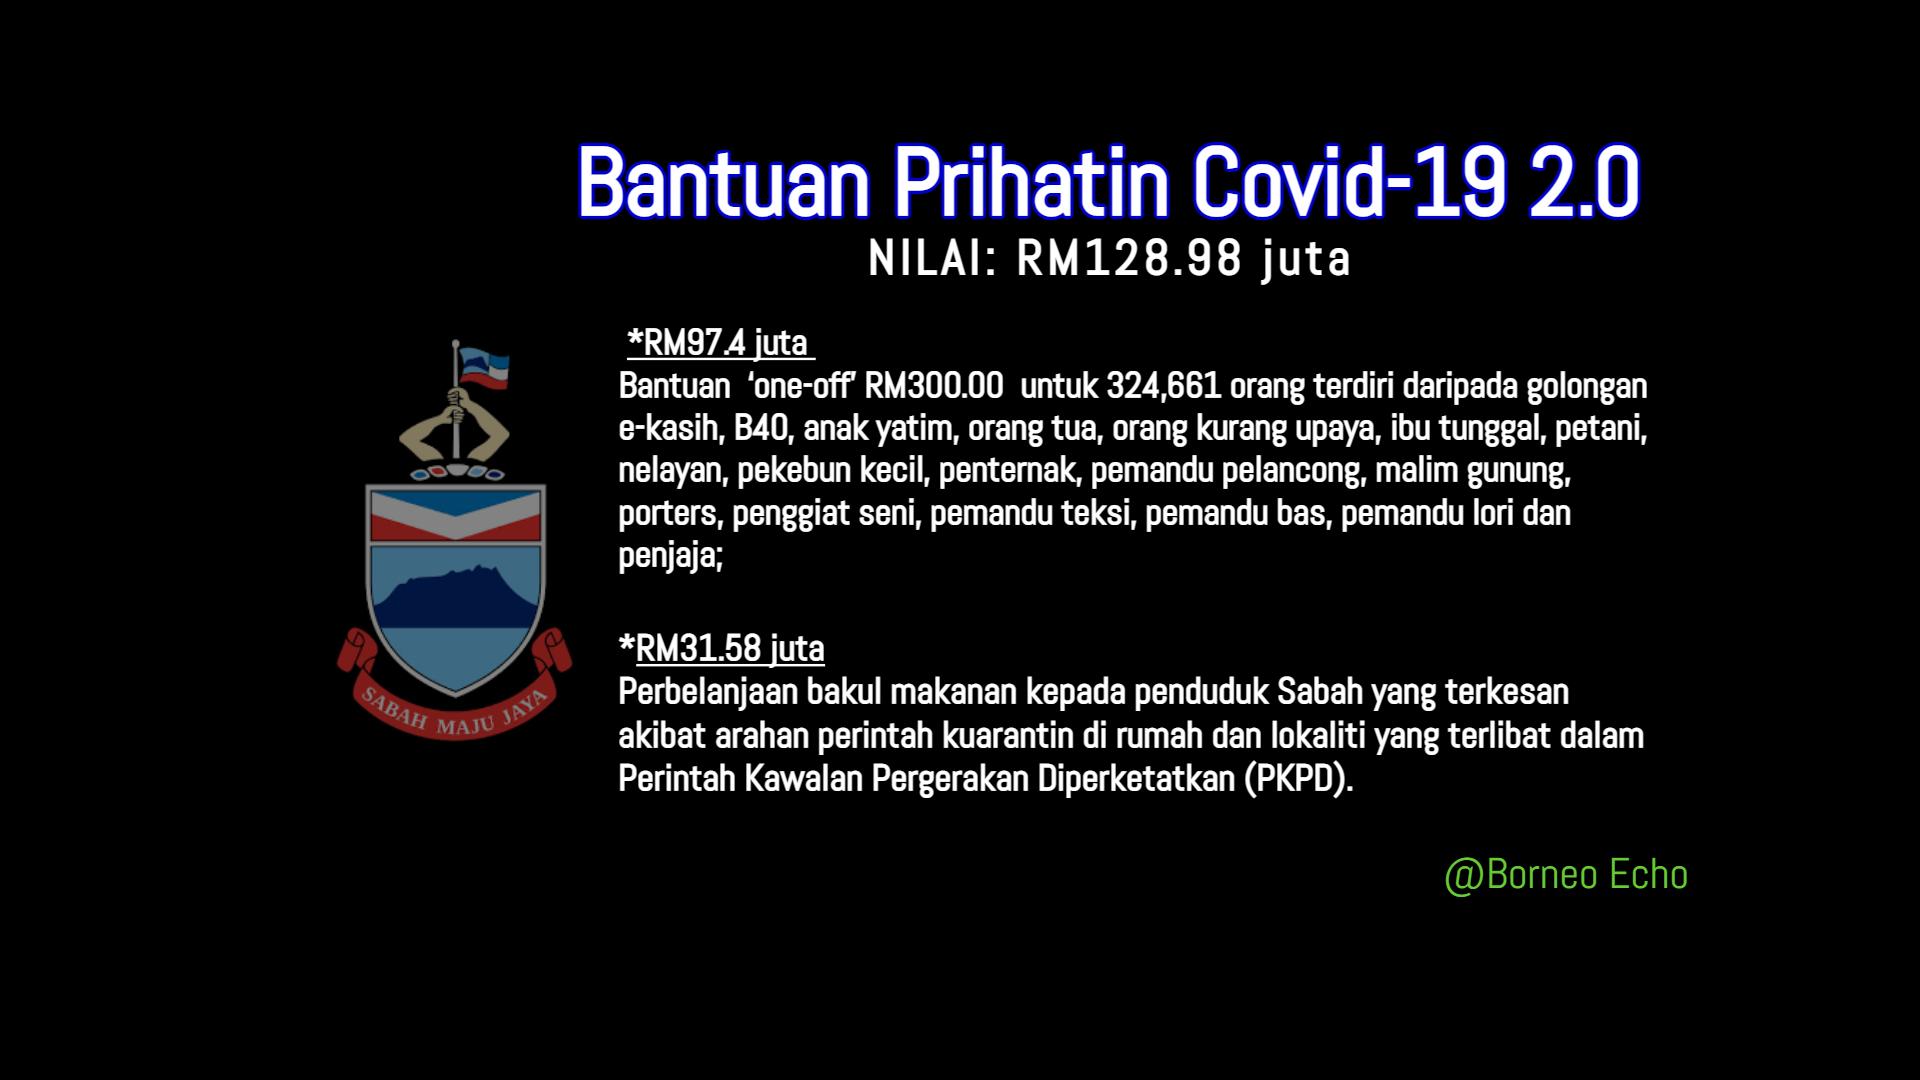 Bantuan Prihatin Covid-19 Sabah@BorneoEcho